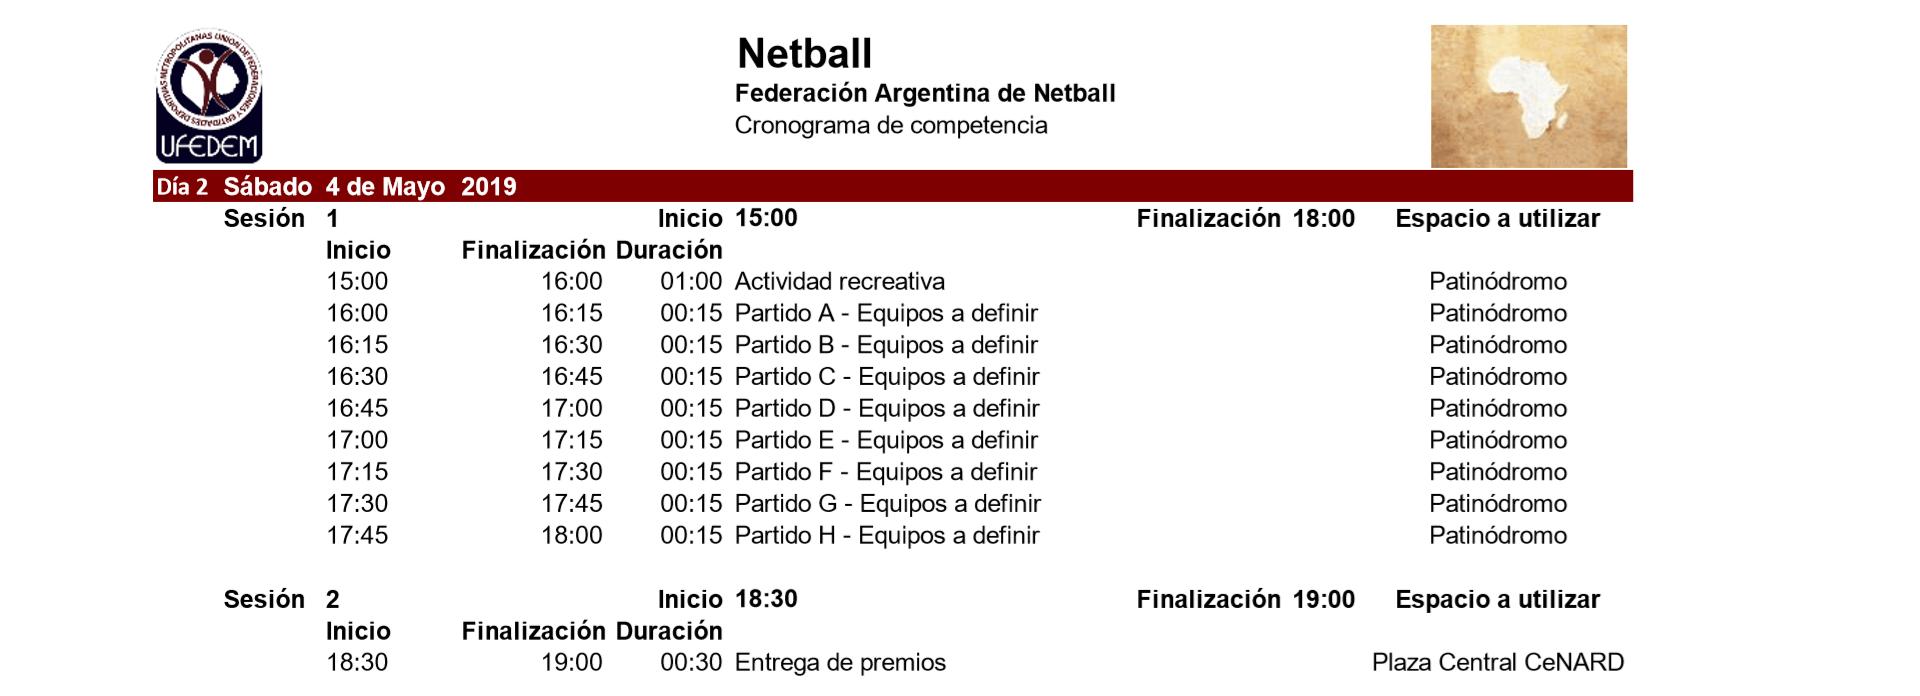 Netball 2.1 - Cronograma